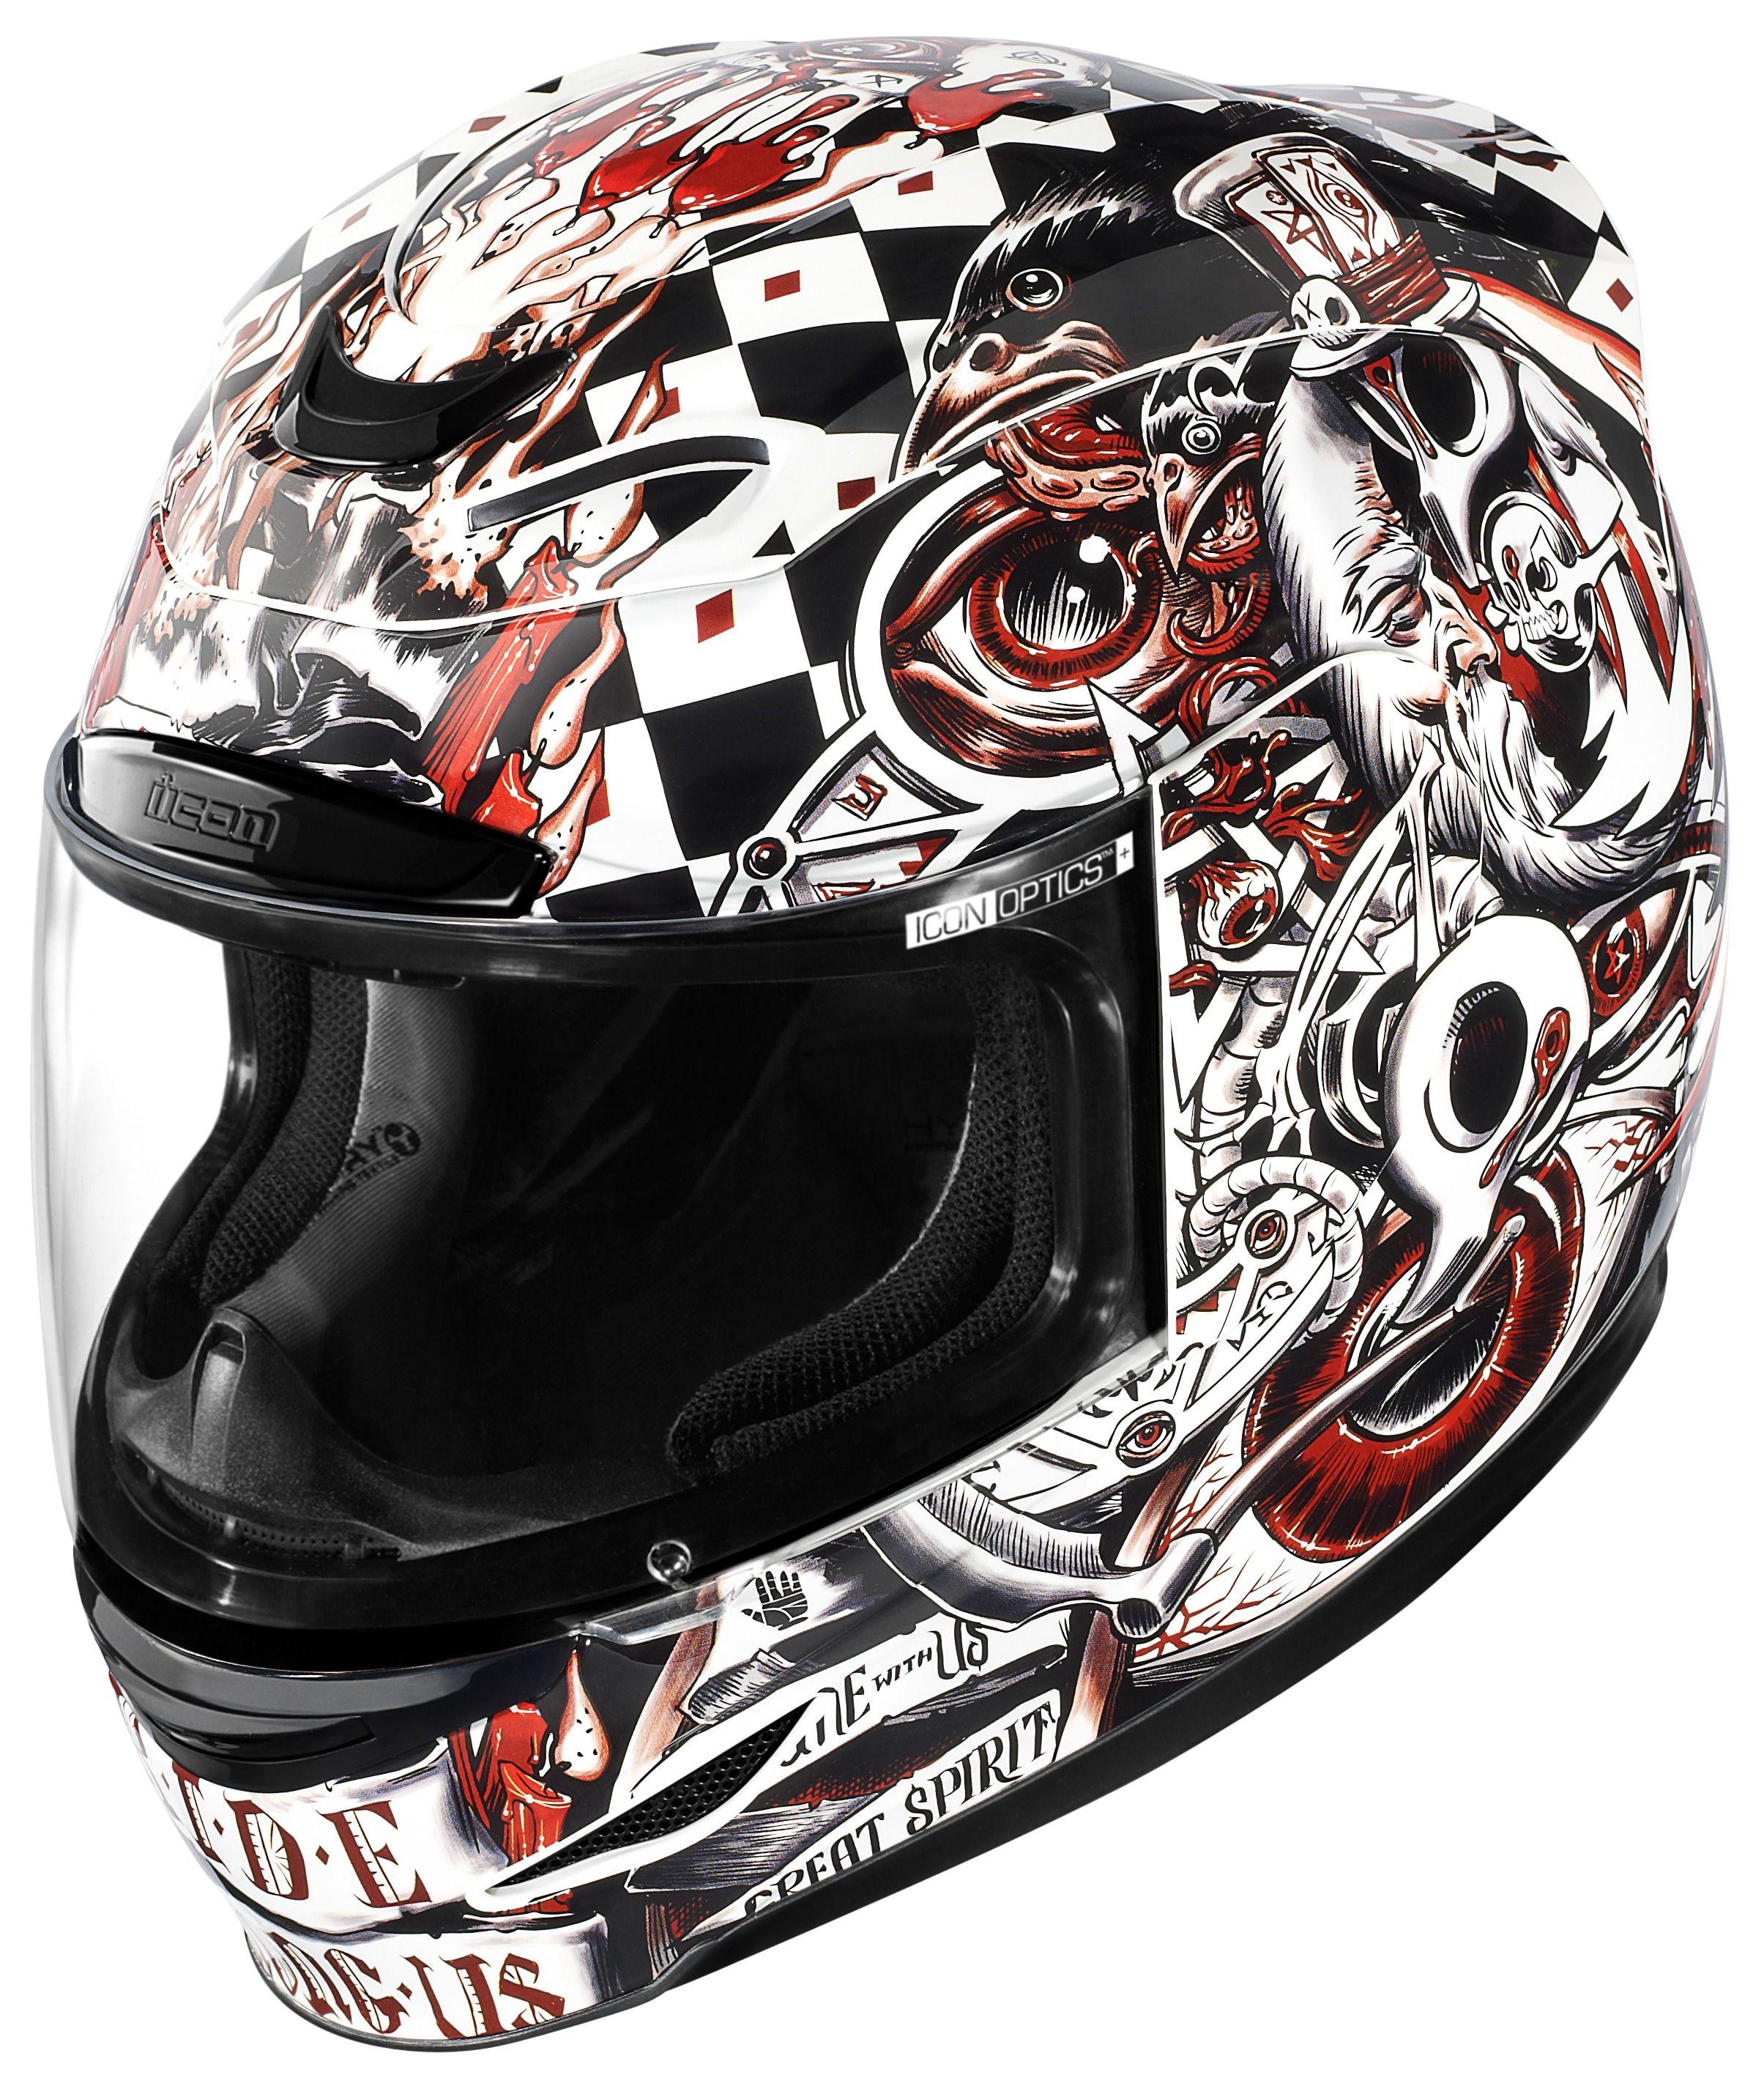 Reevu MSX1-R Rear-View Helmet - RevZilla